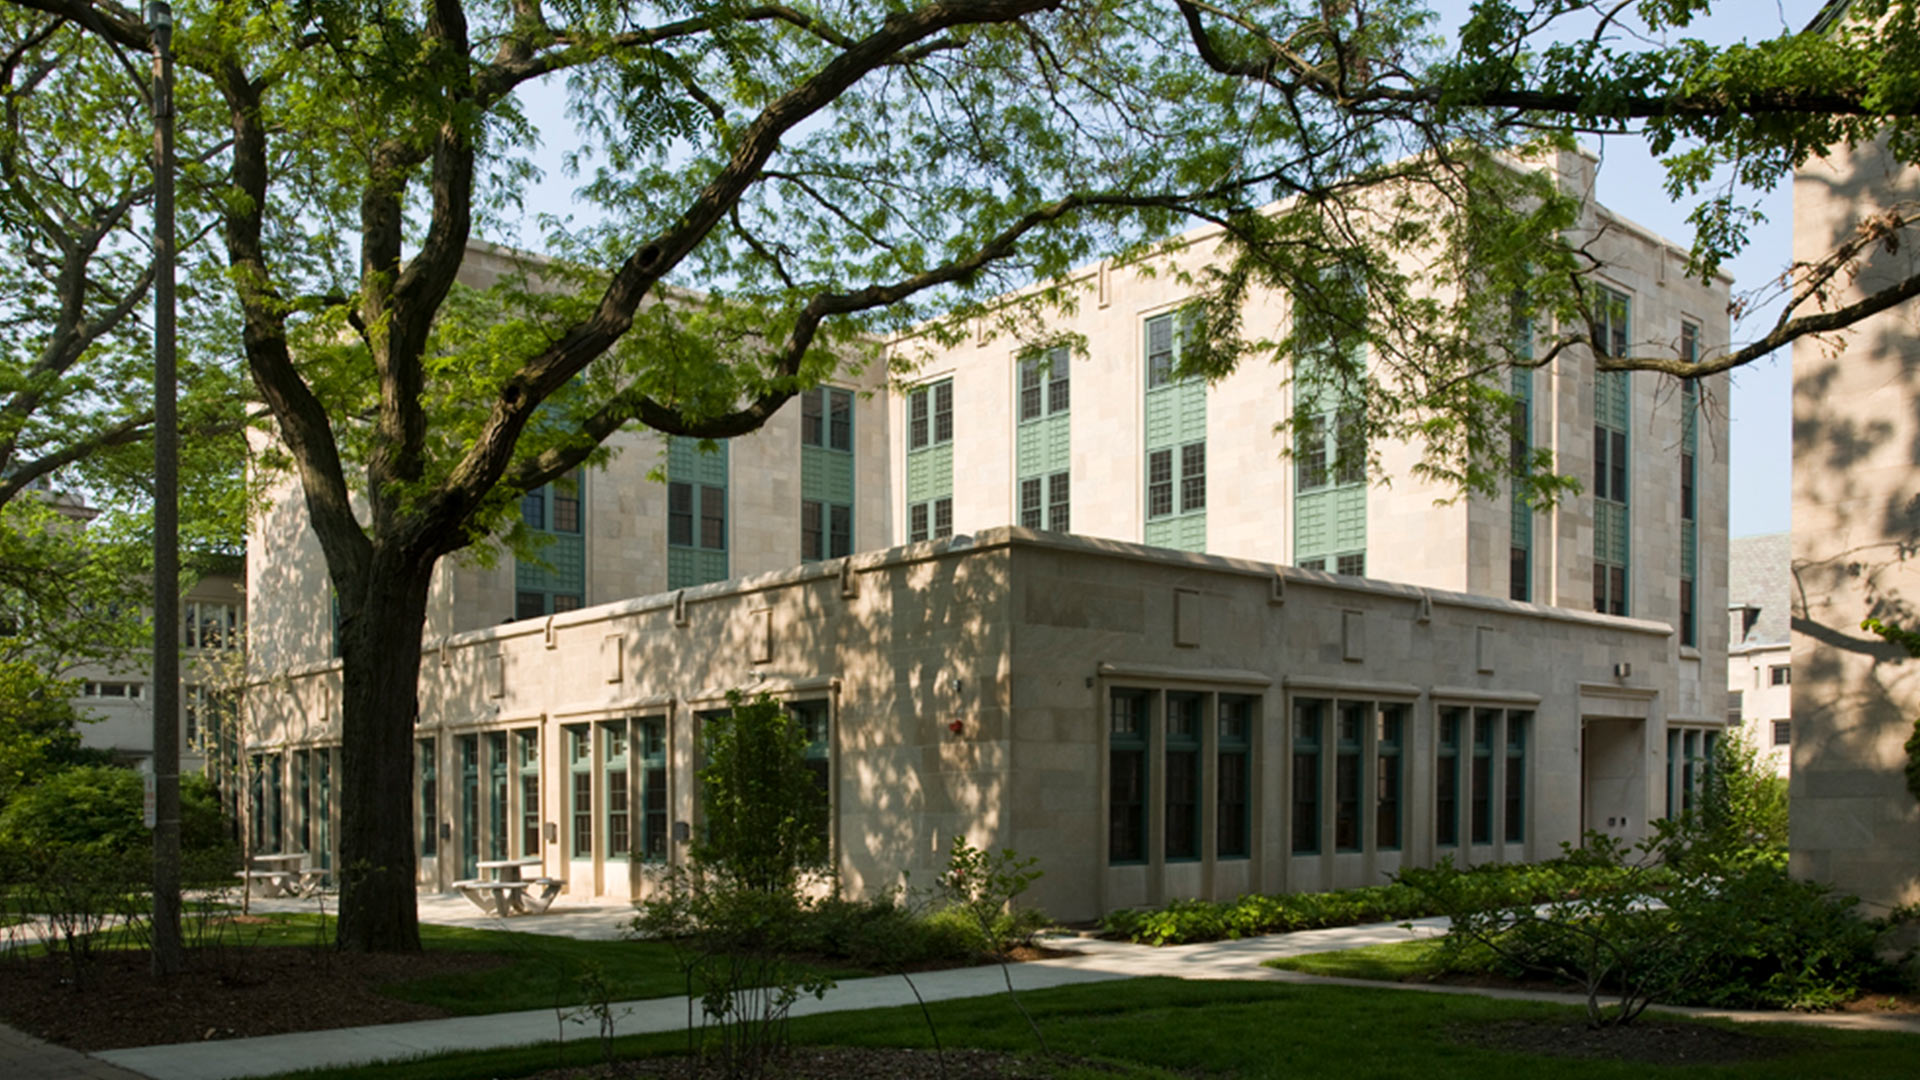 Garrett-Evangelical Theological Seminary: Loder Hall